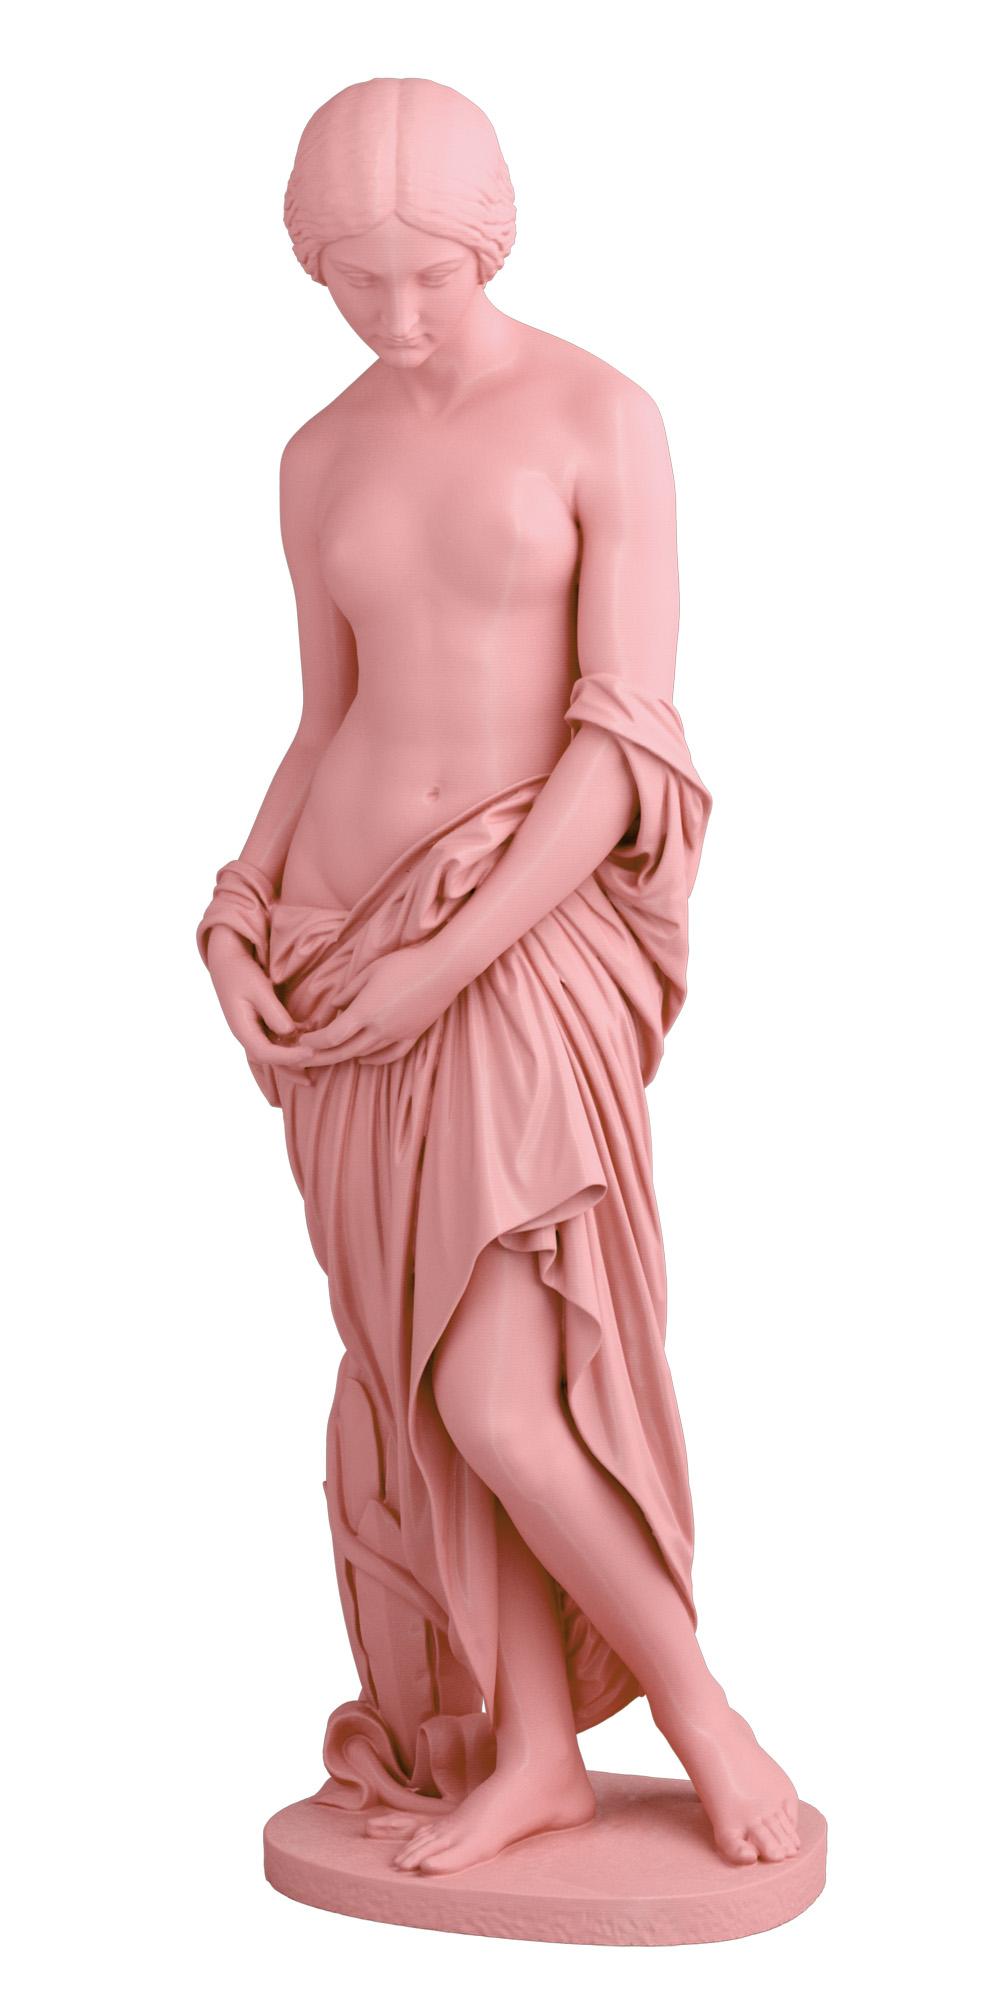 3D Printed Statue of Aphrodite